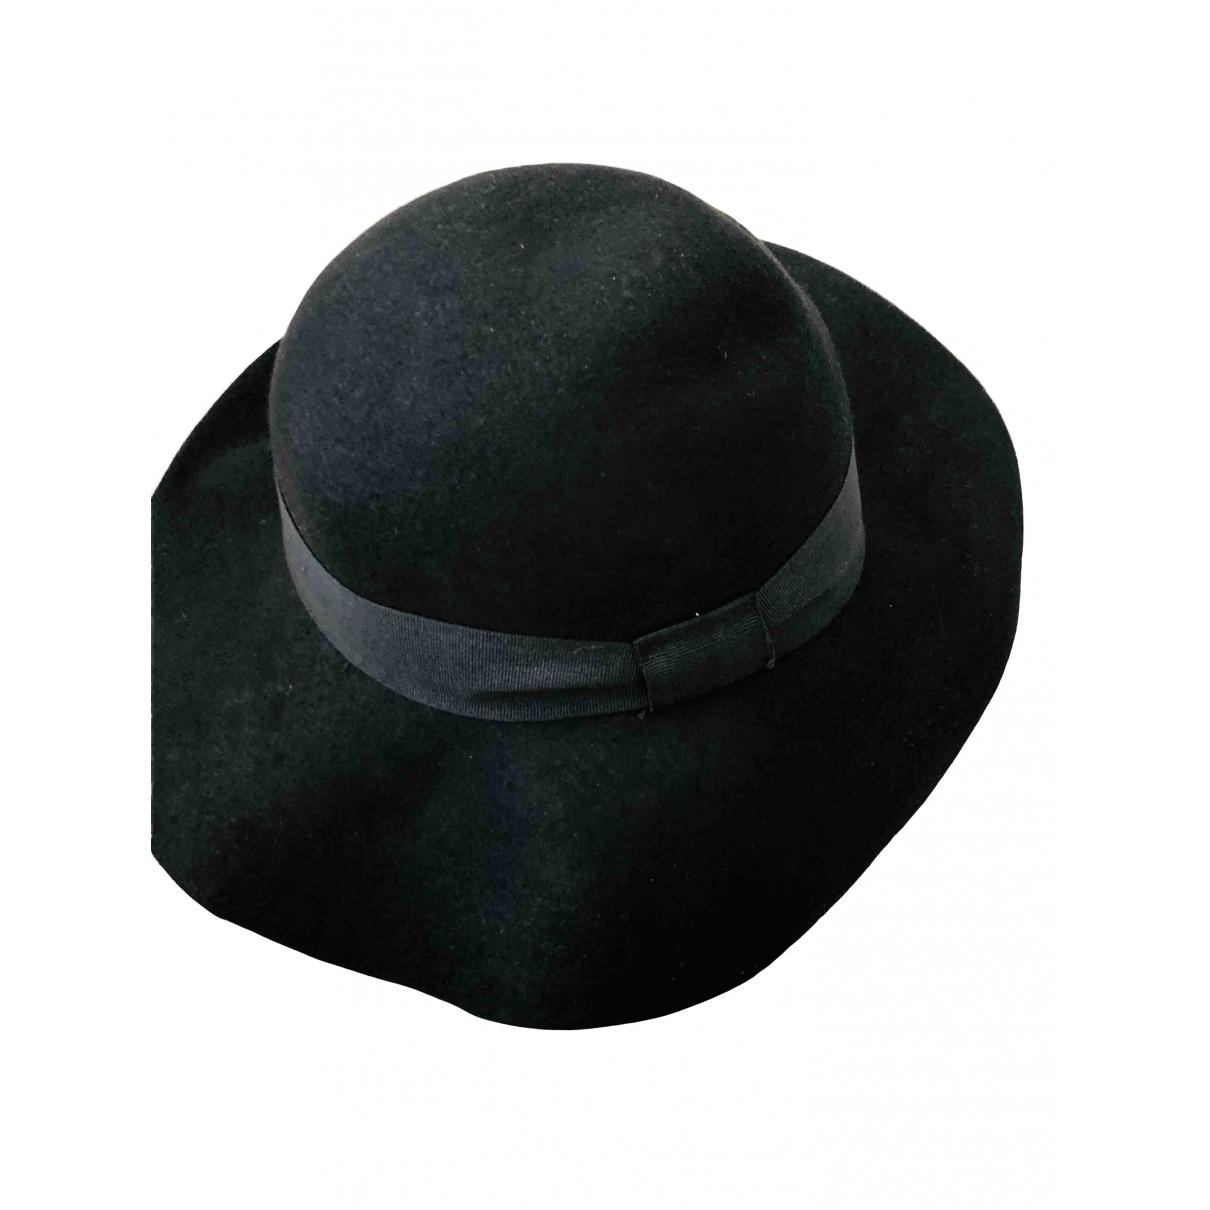 Sombrero de Lana Reiss